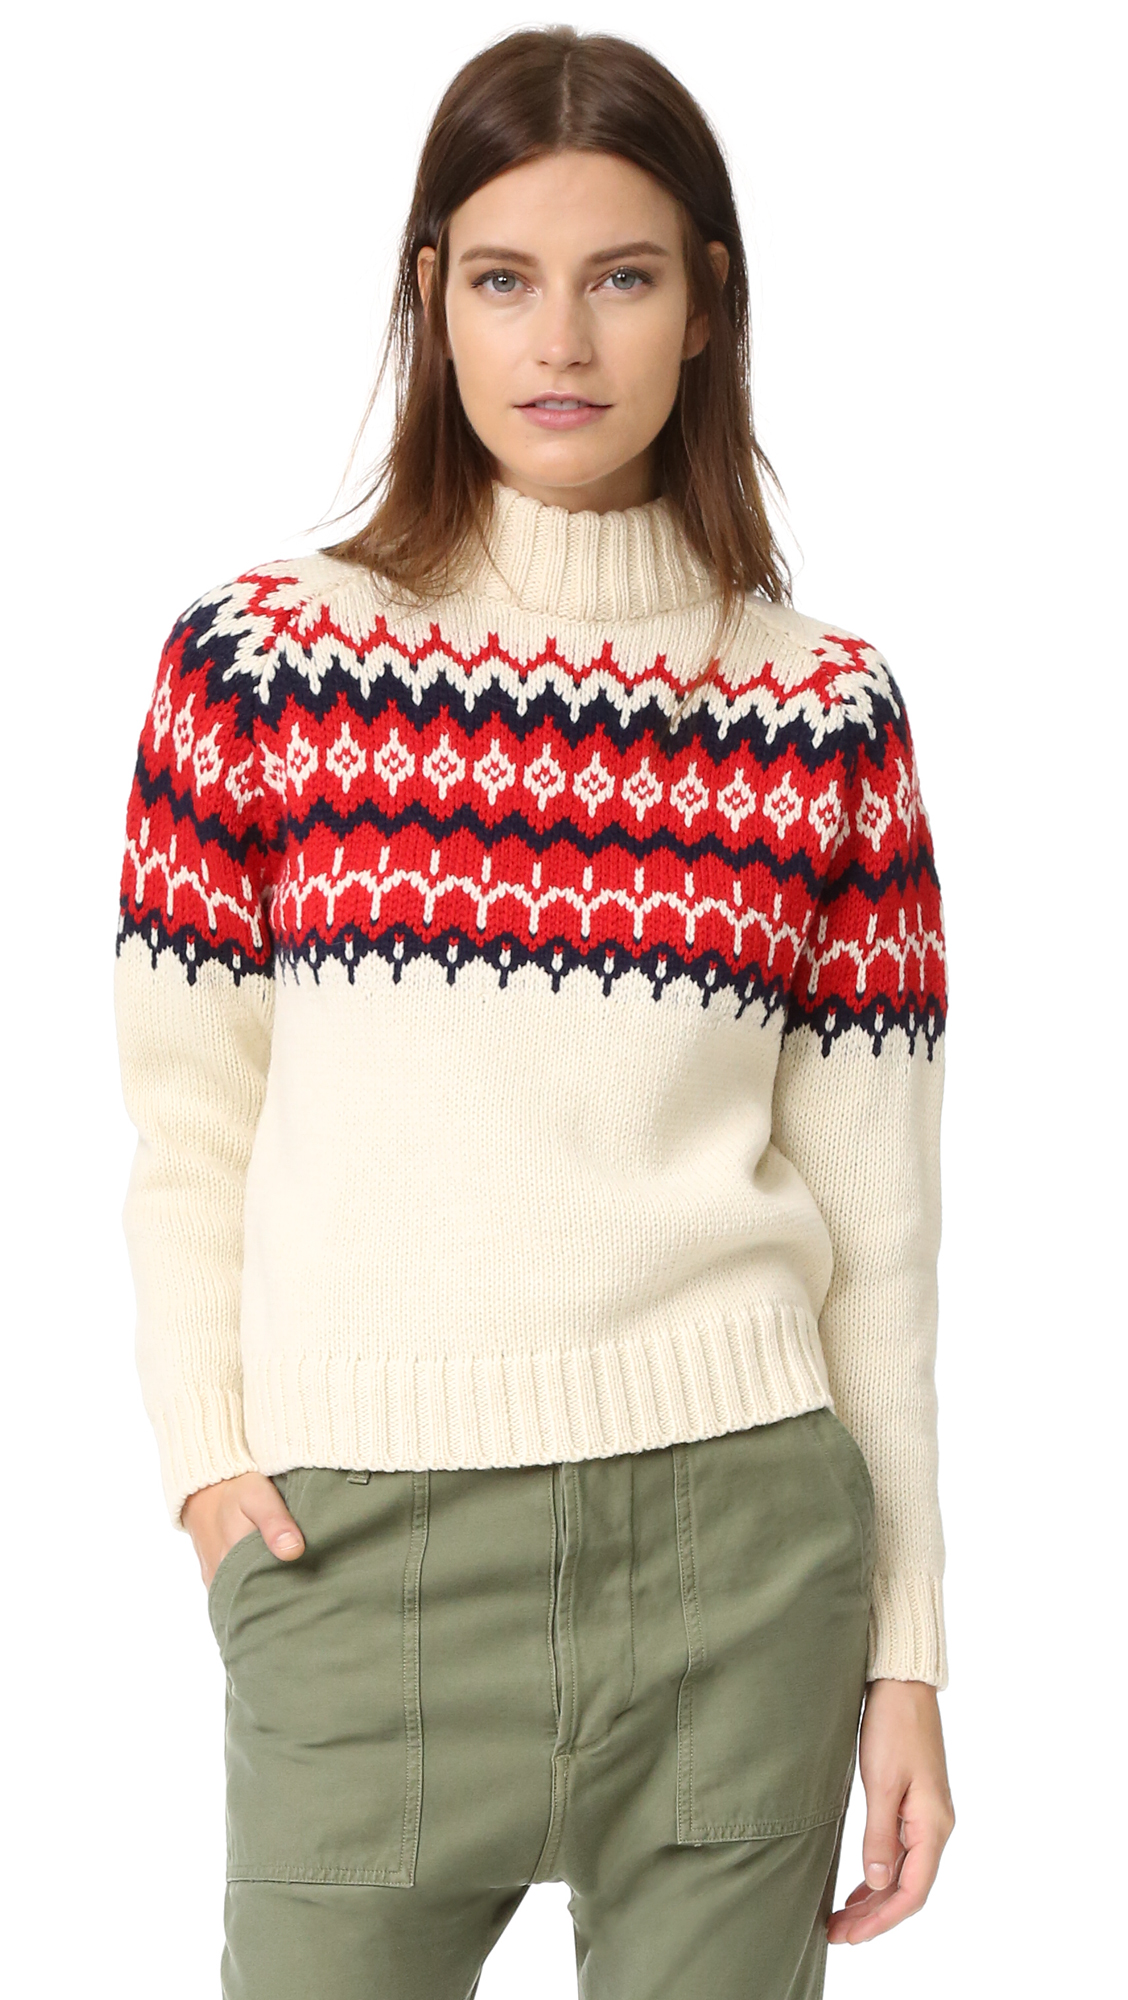 &Daughter Fair Isle Knit Sweater - Ecru/Red at Shopbop